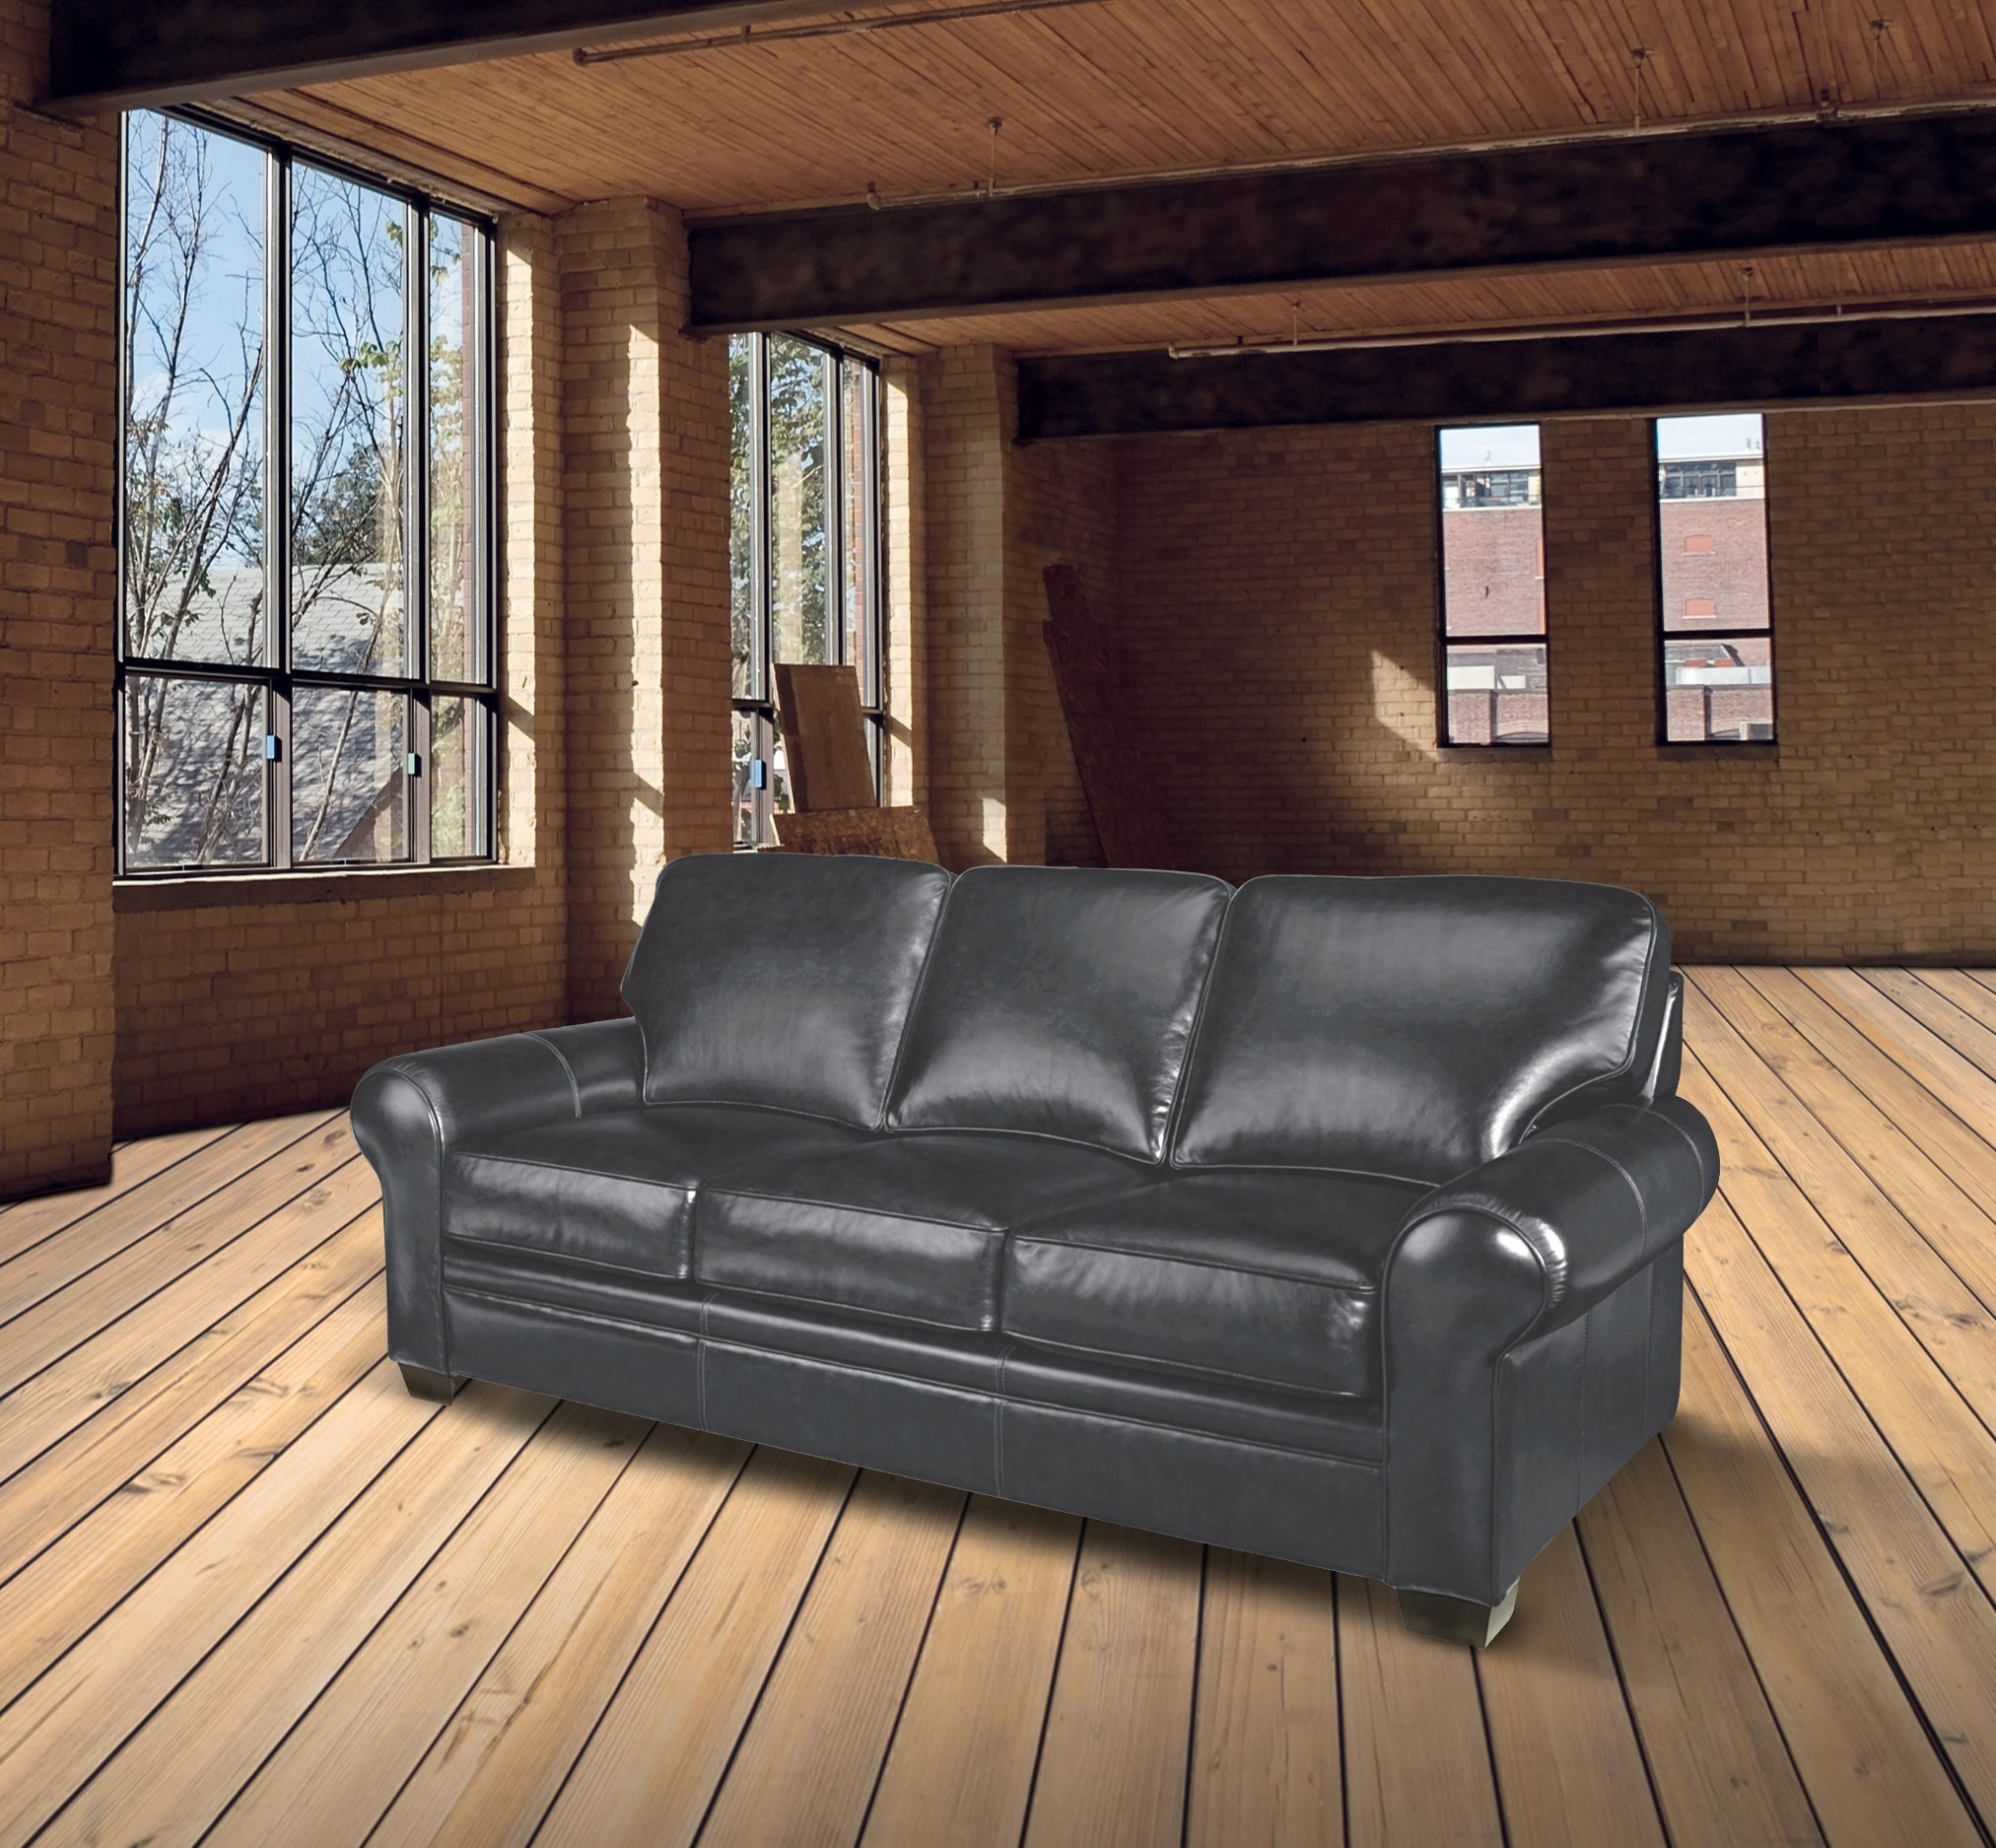 Leather Furniture Company: Rebecca Sofa Factory Super Special